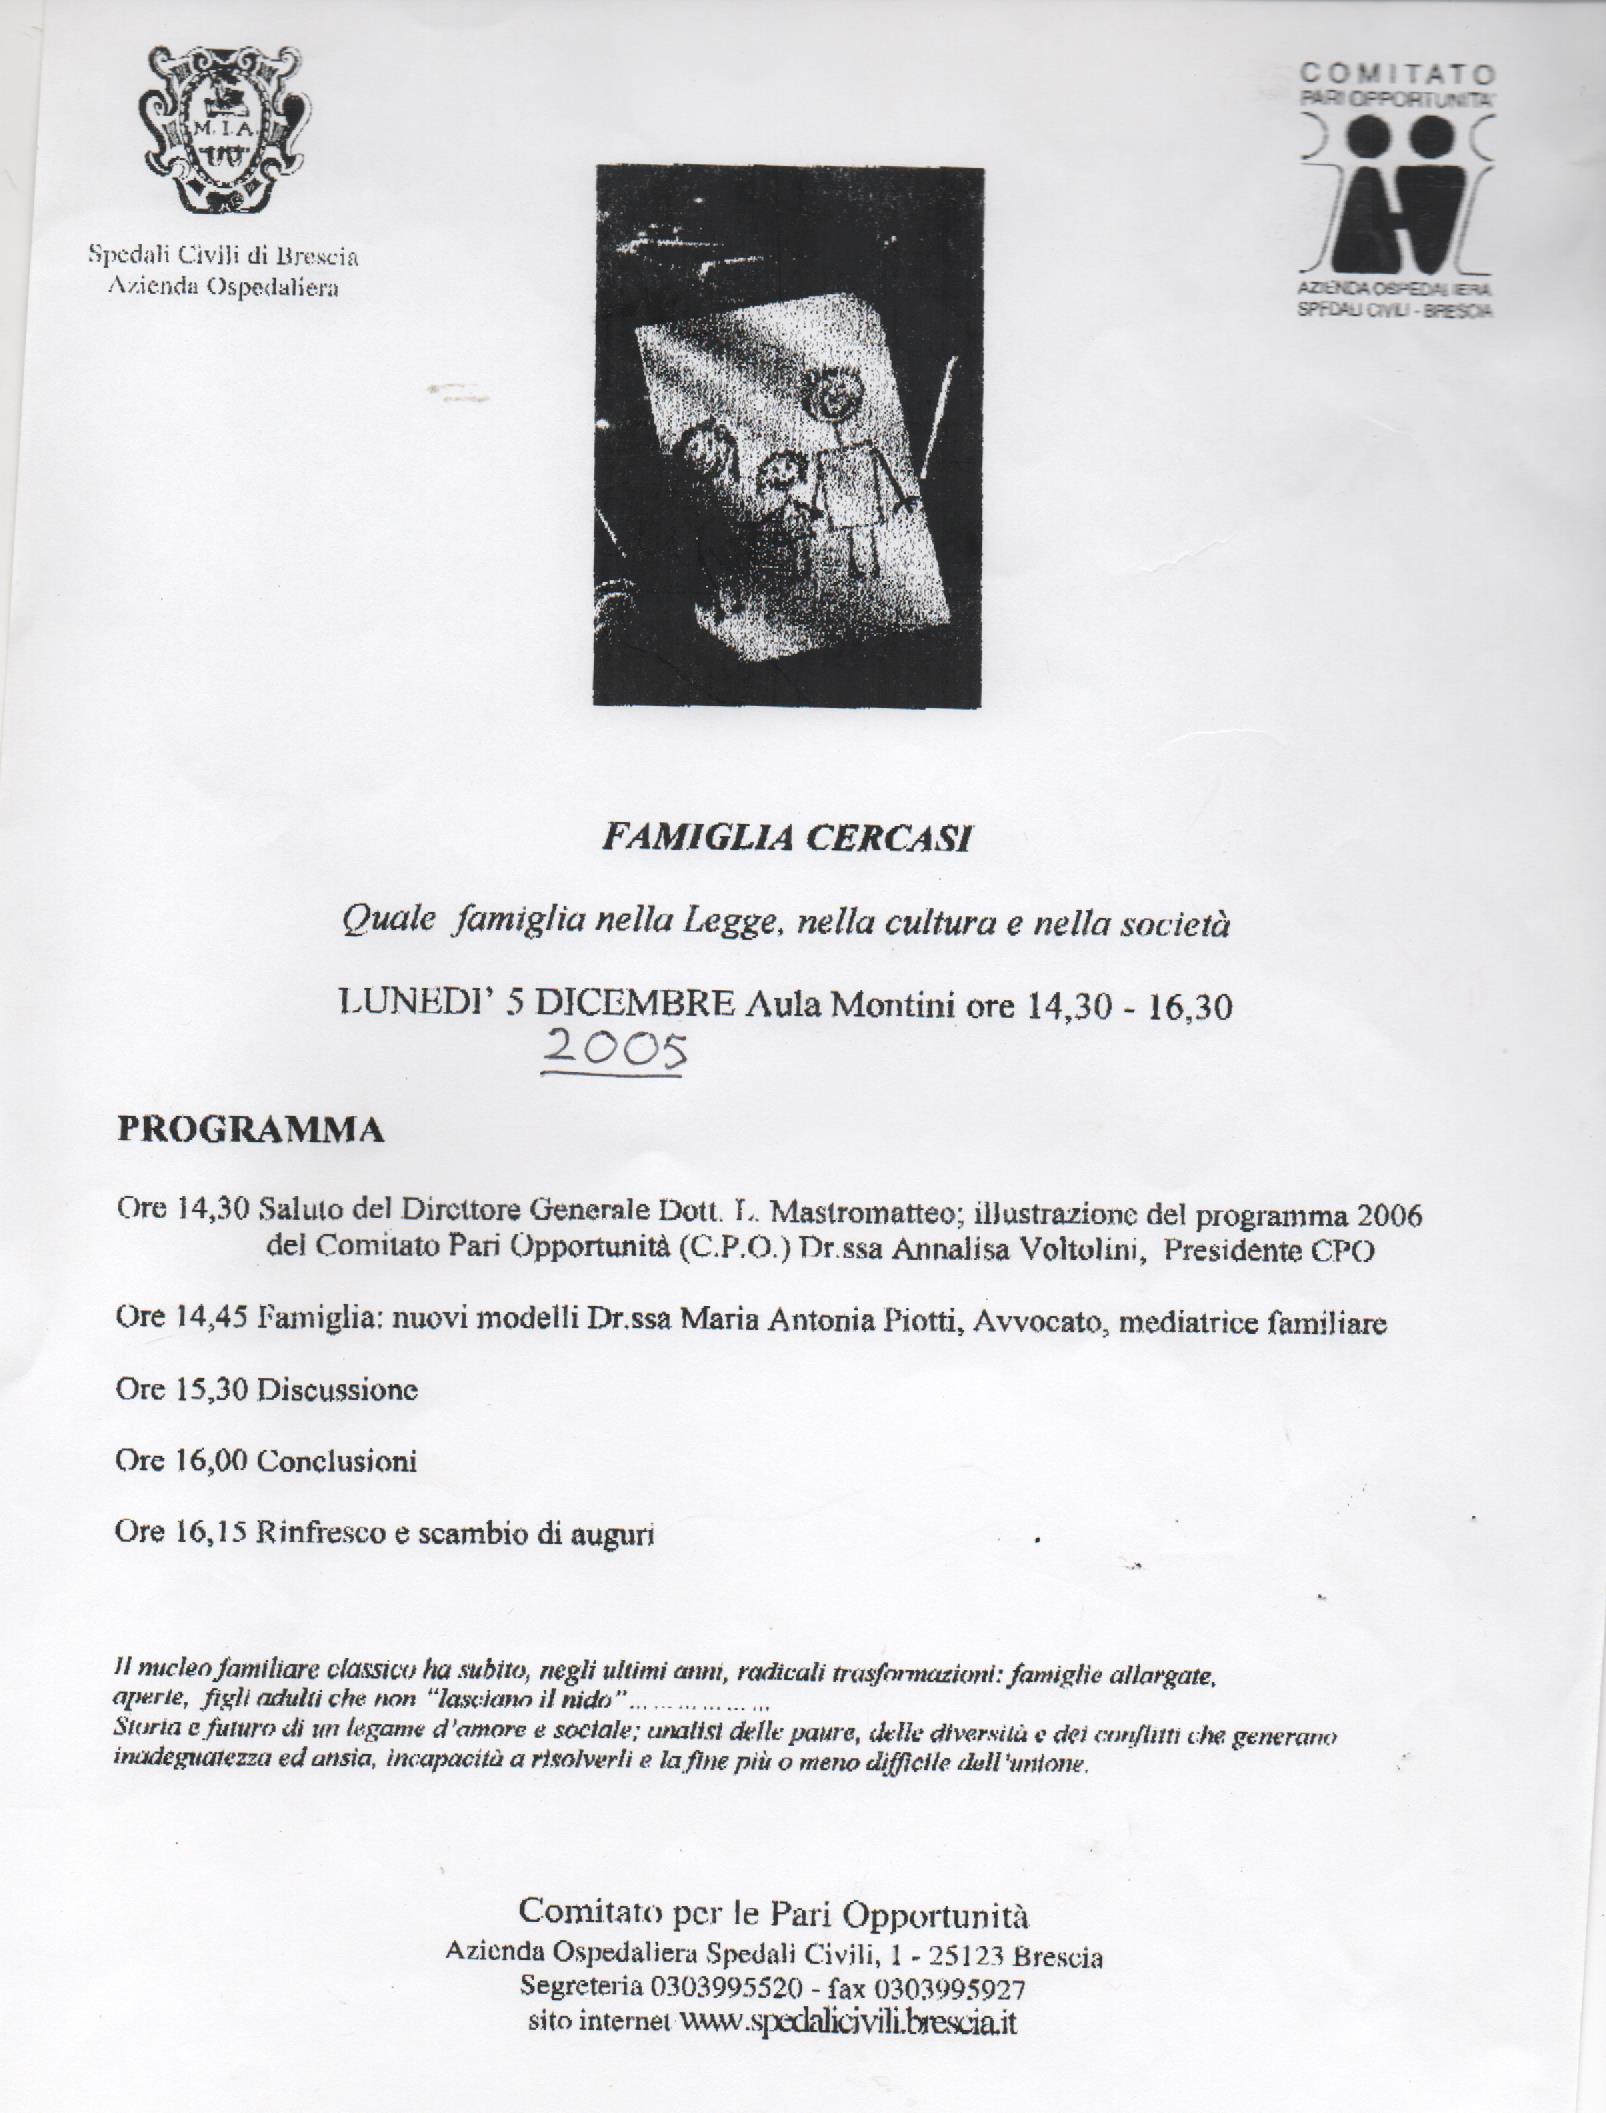 ospedale-brochure